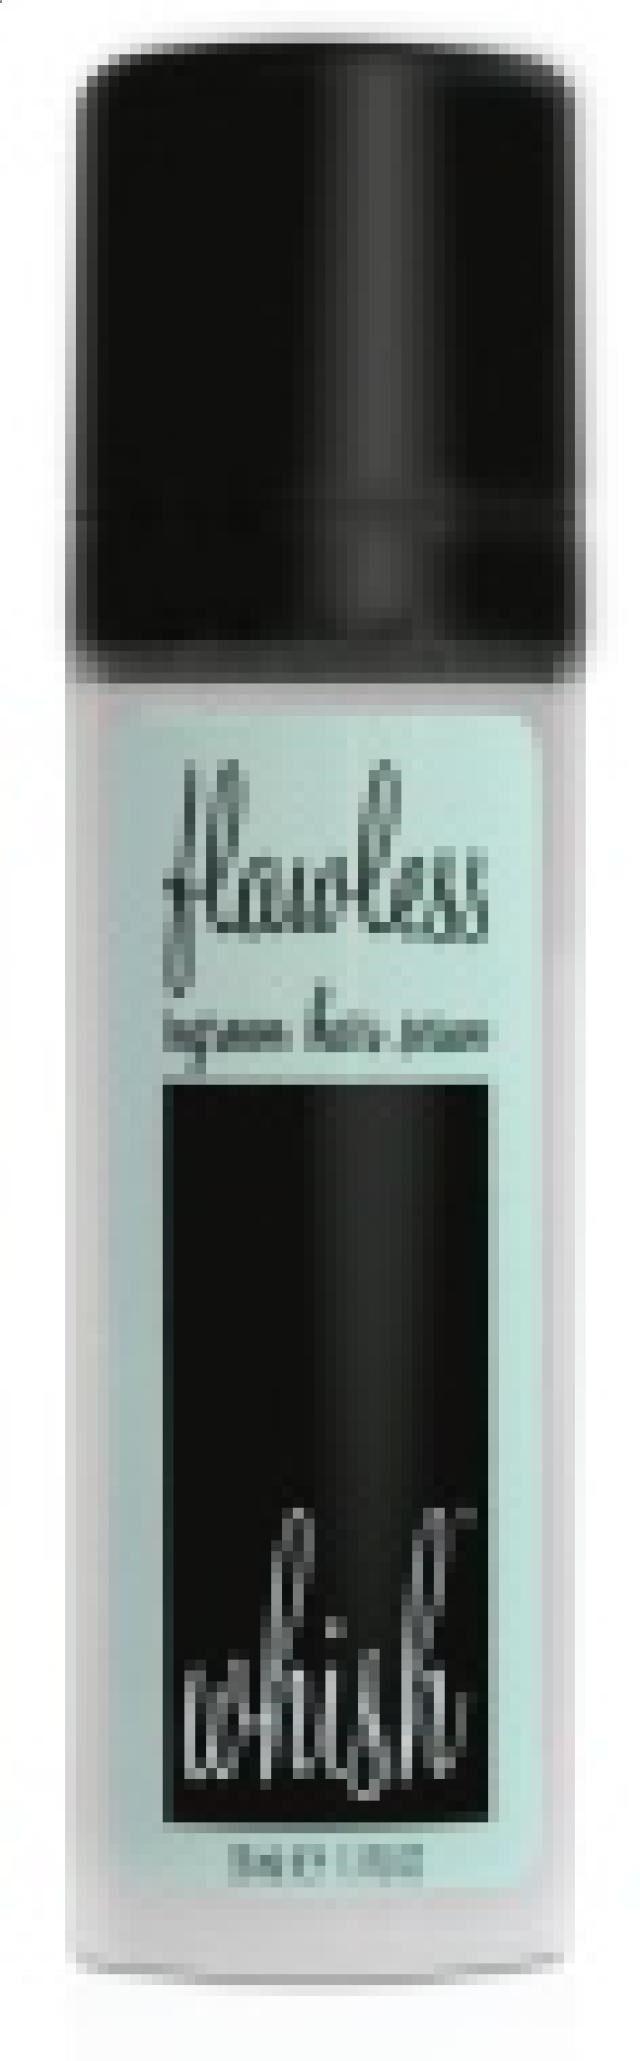 The Best Products for Treating Ingrown Hairs: Whish Flawless Ingrown Hair Serum